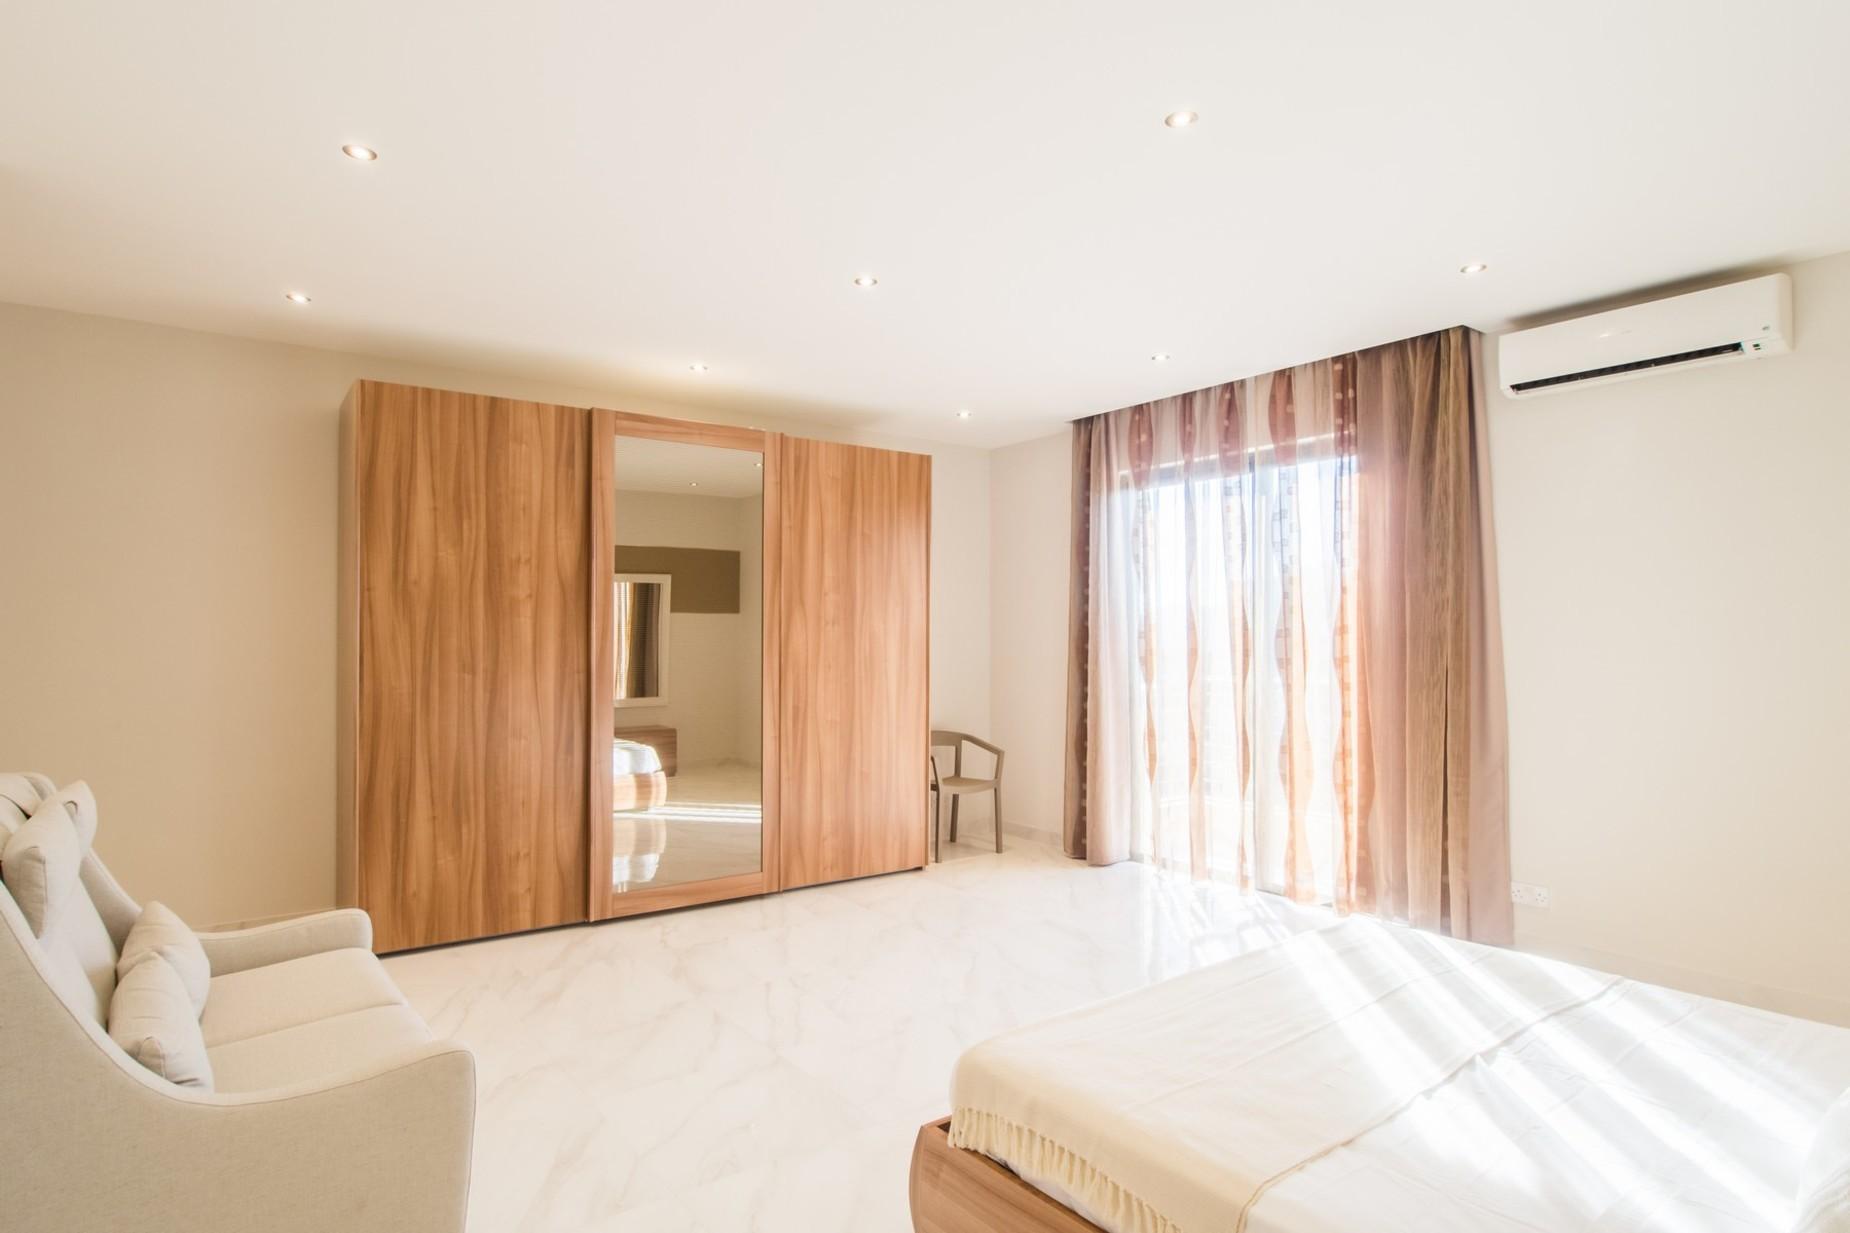 2 bed Apartment For Rent in Xemxija, Xemxija - thumb 11